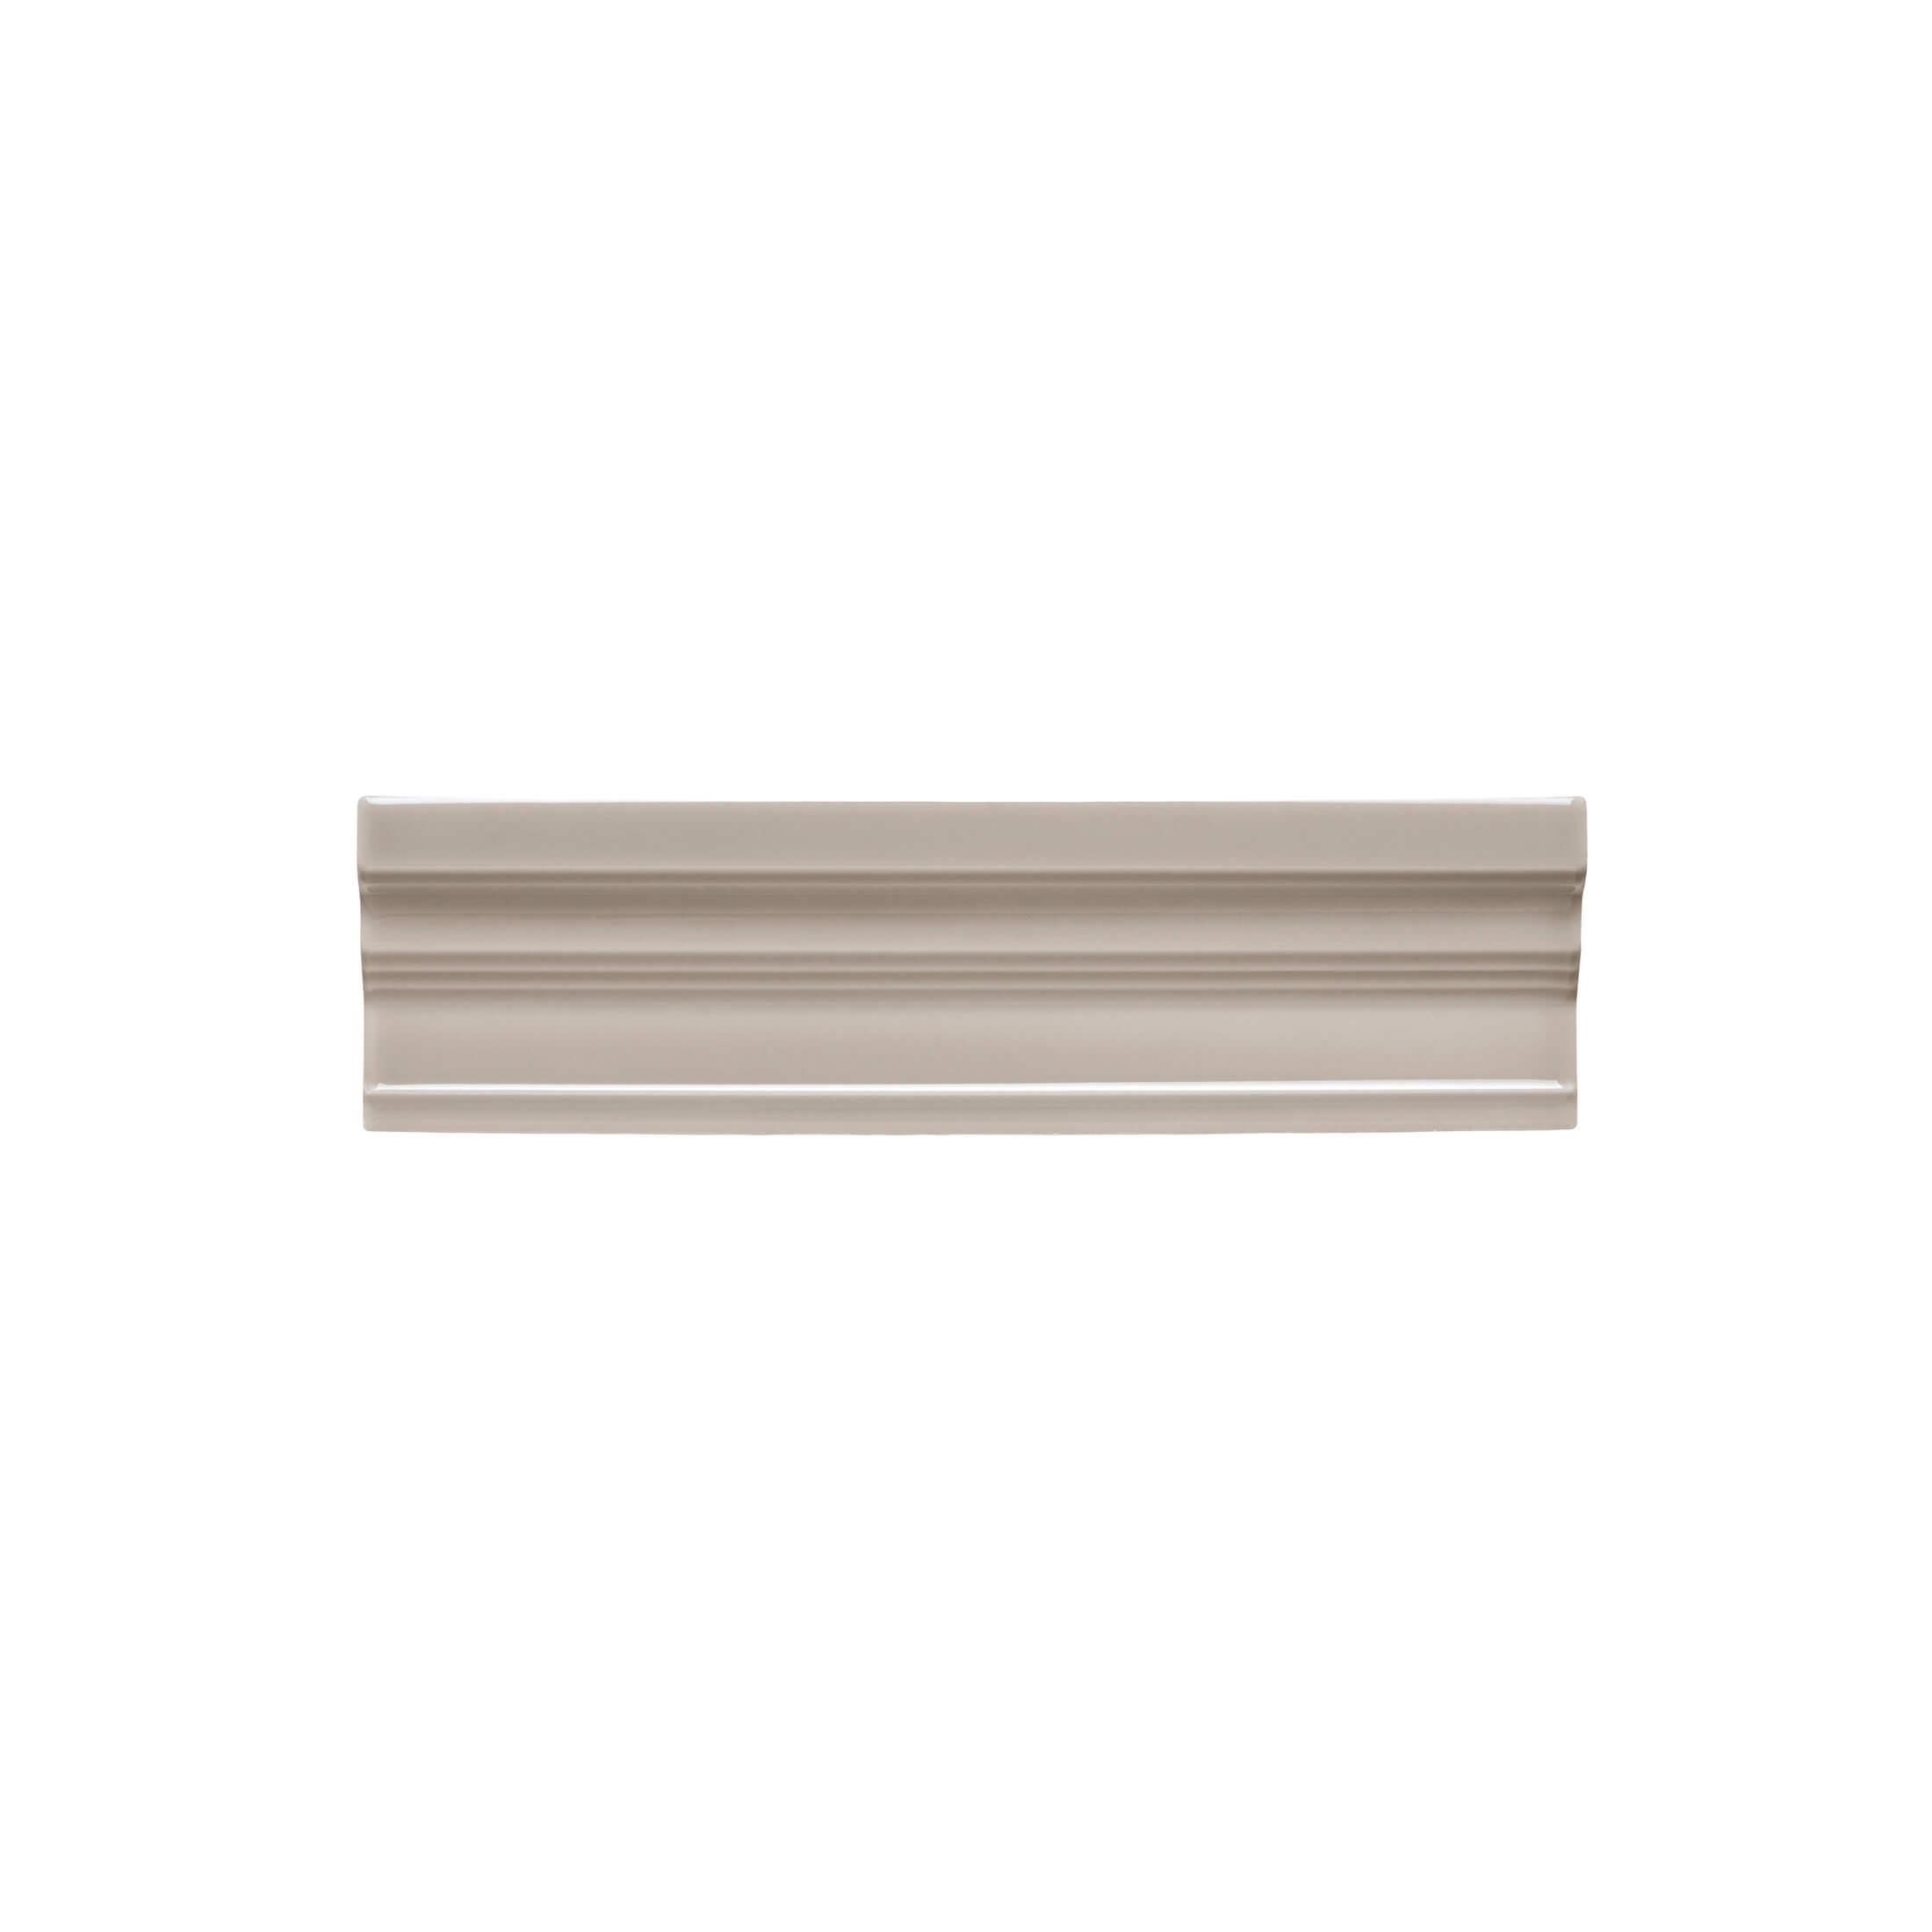 ADNE5467 - CORNISA CLASICA - 5 cm X 20 cm